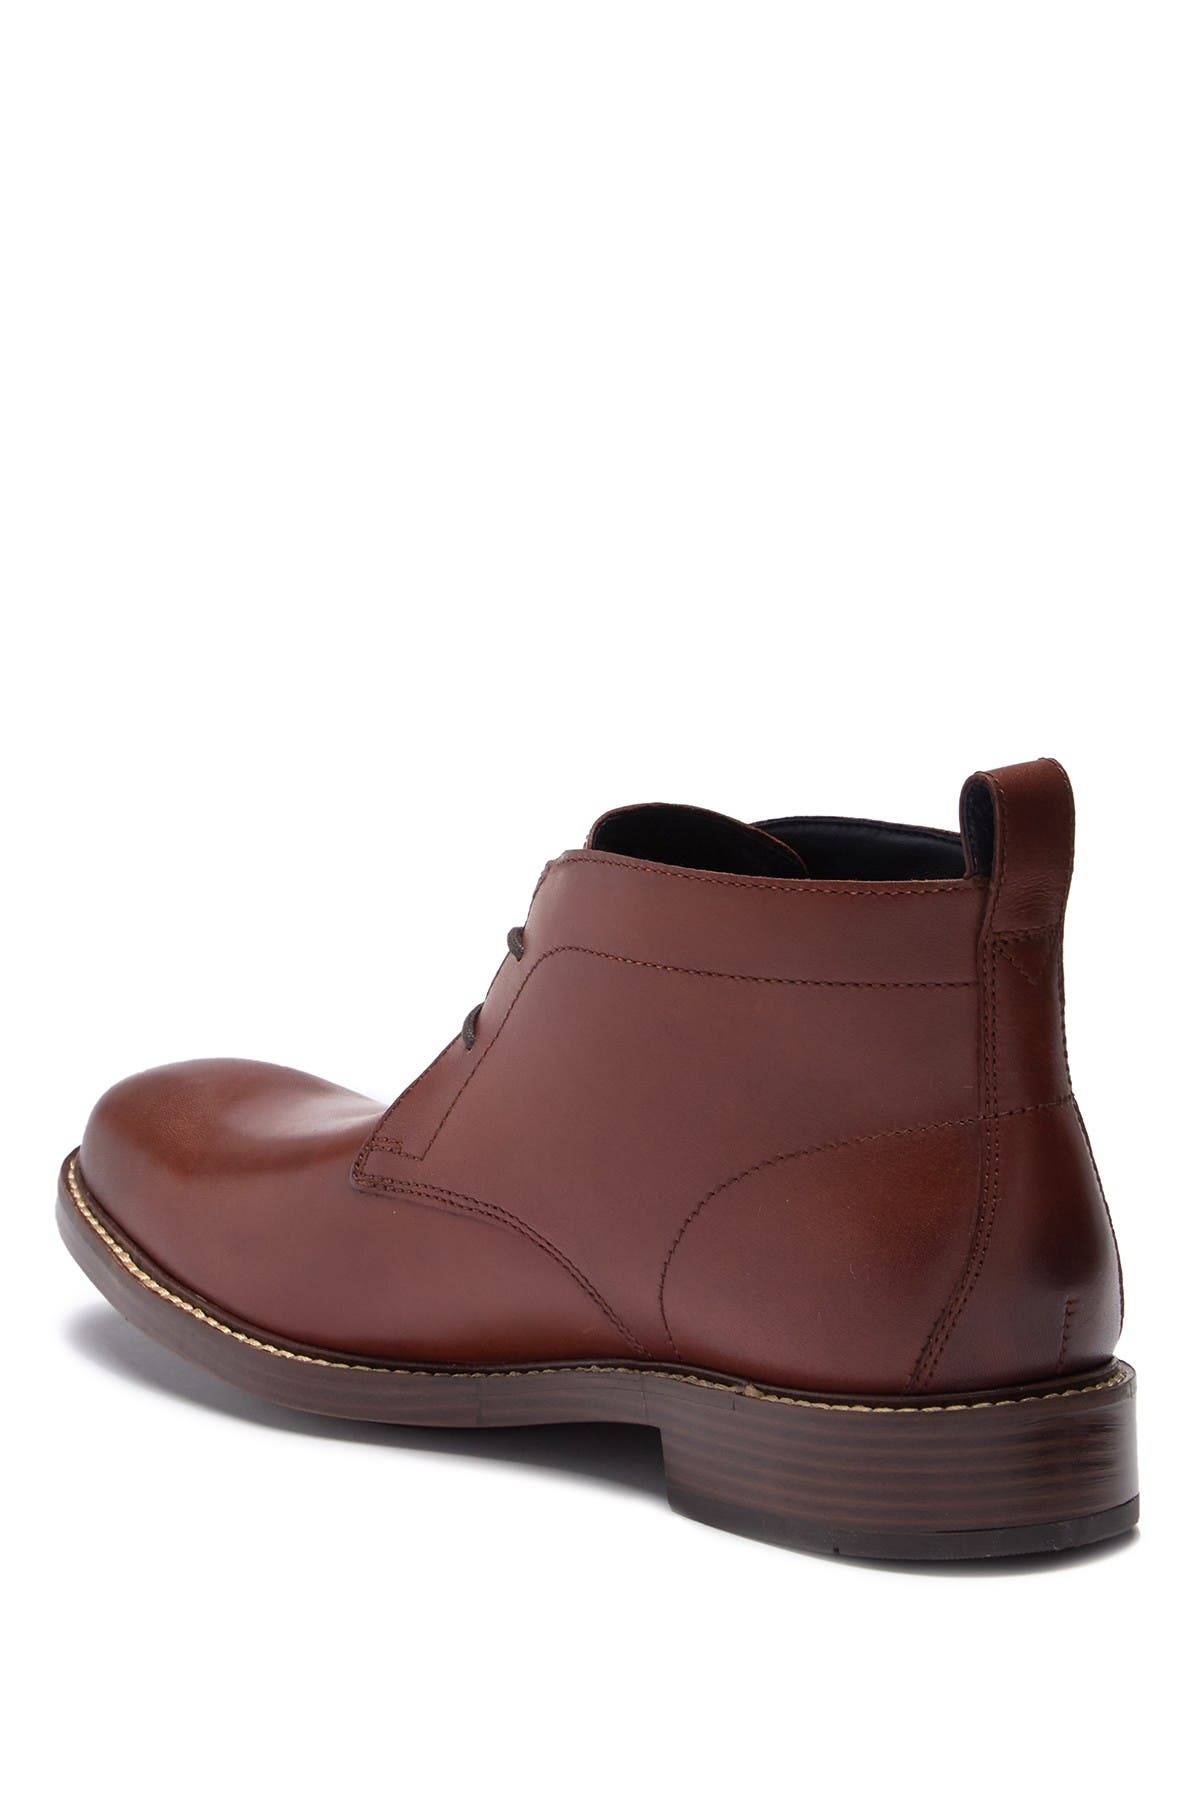 Kennedy Grand Waterproof Chukka Boot